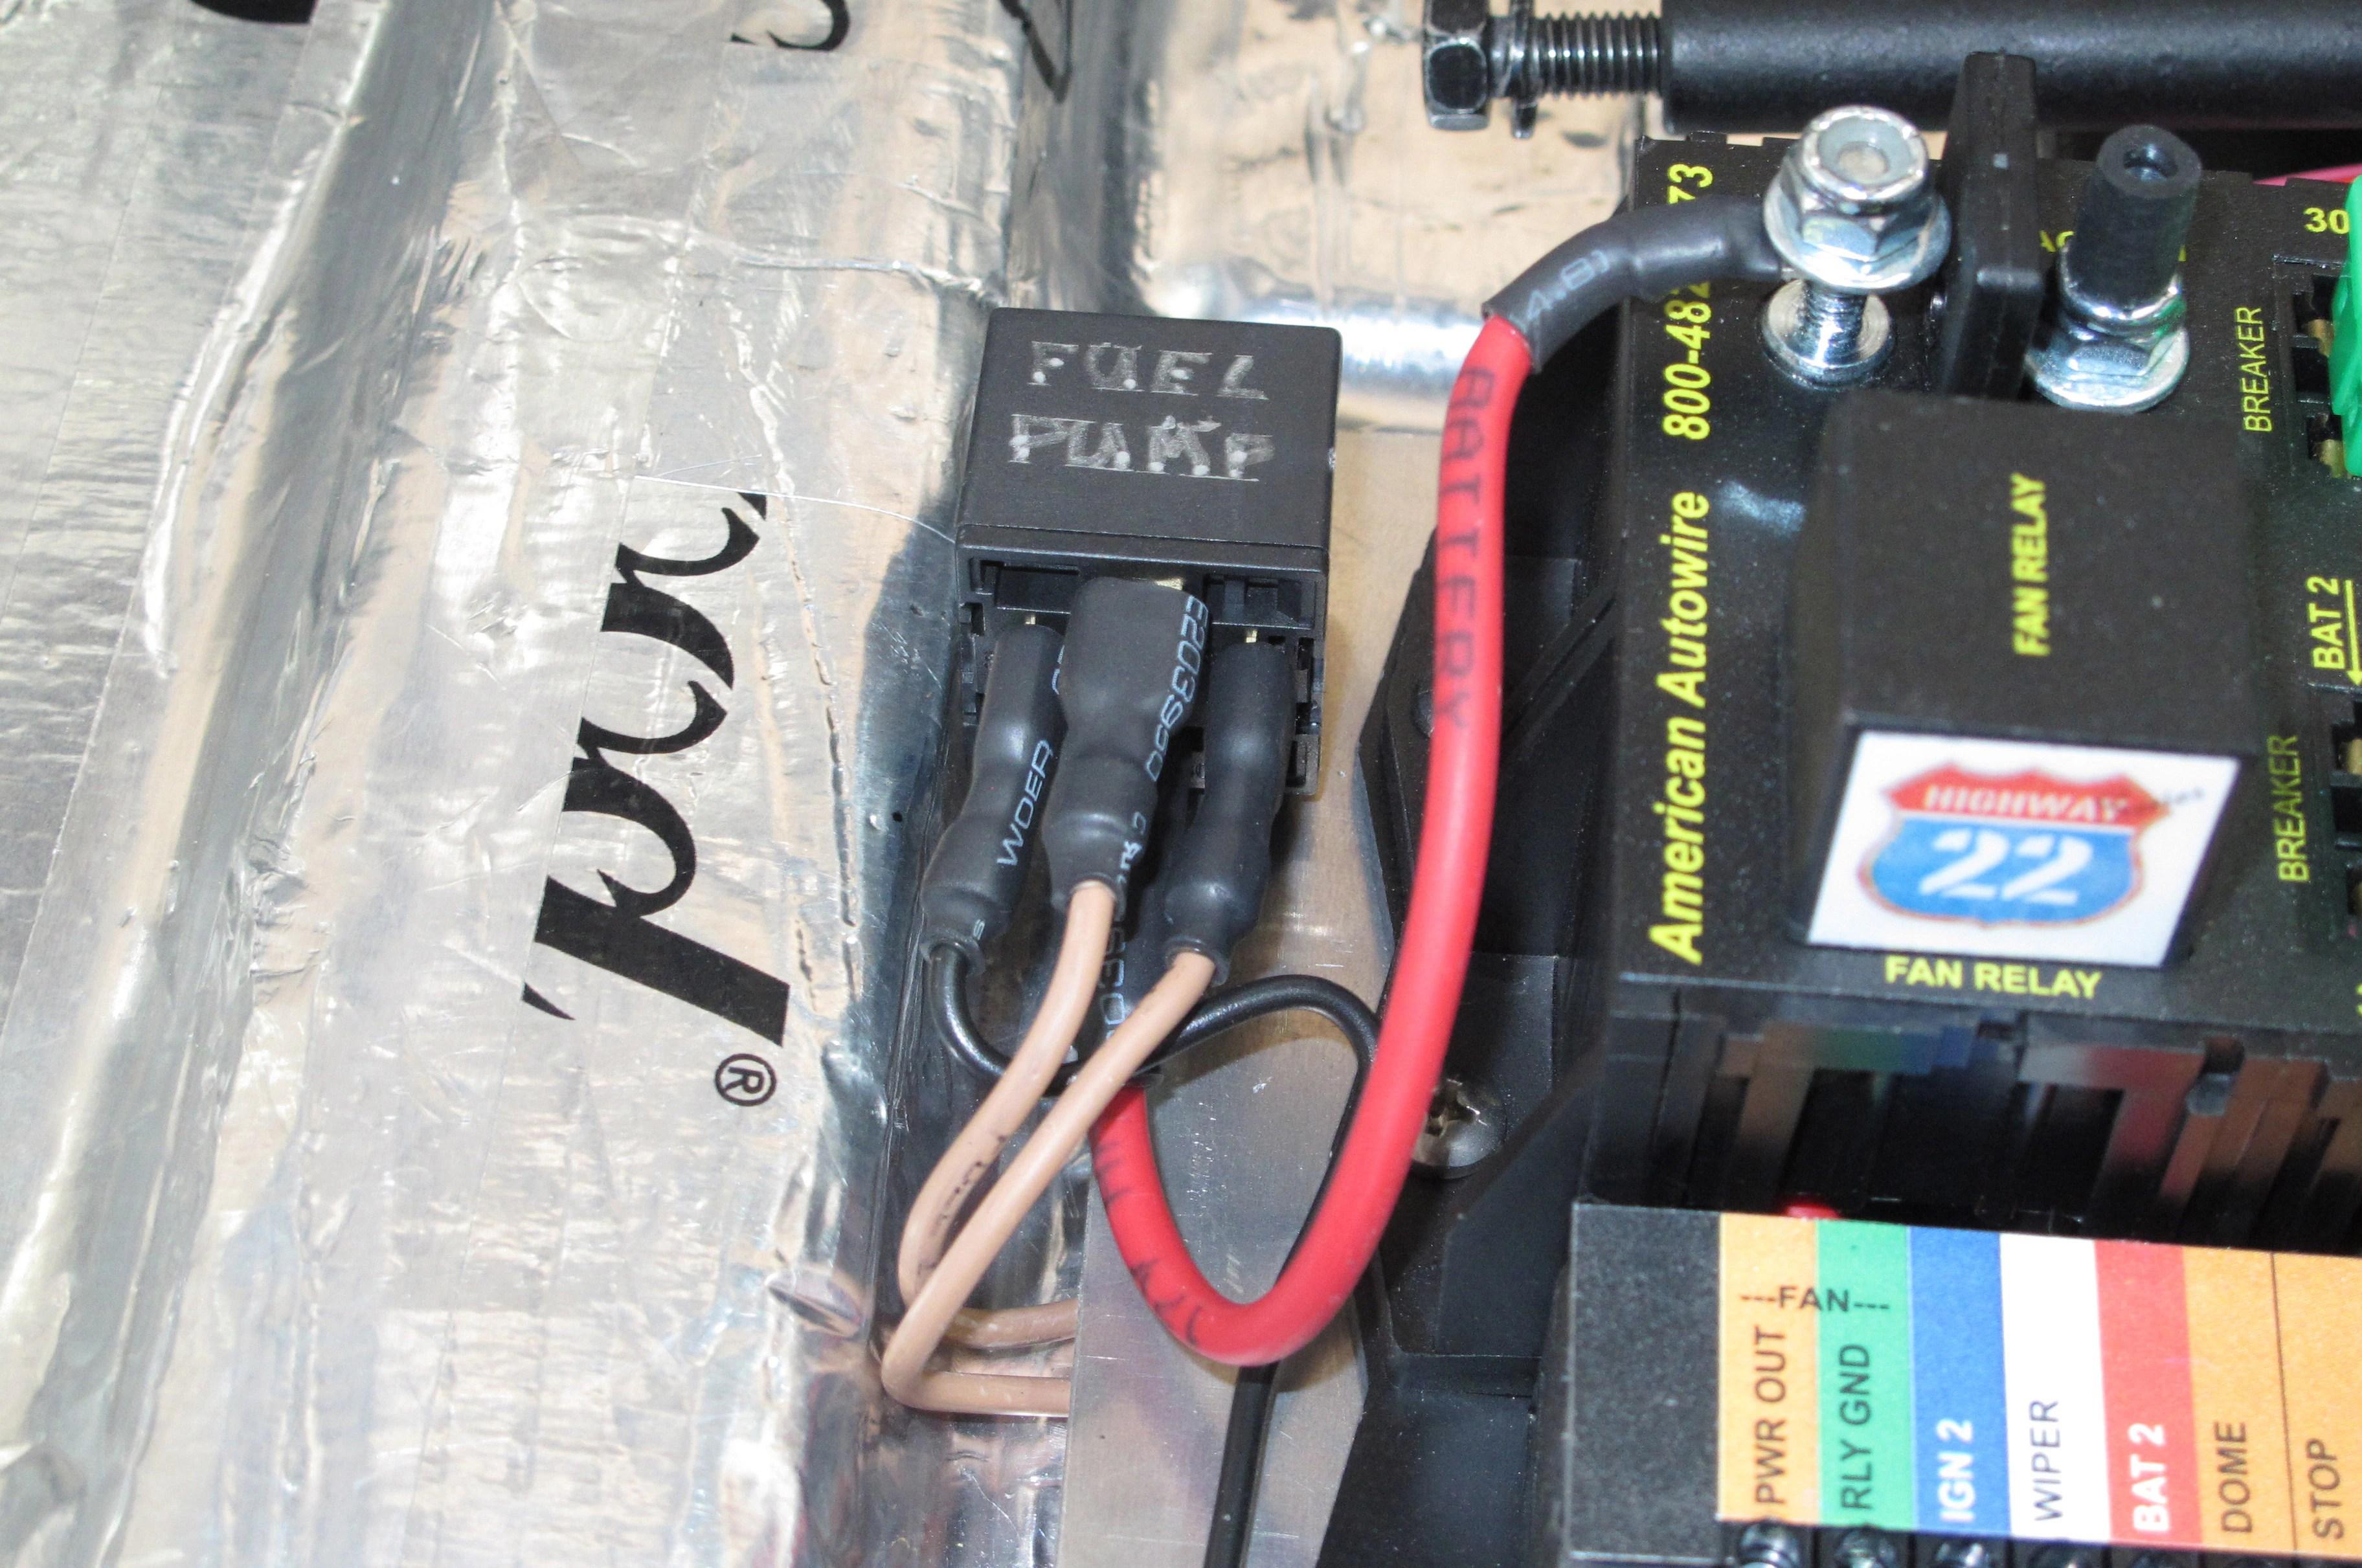 Centech Fj40 Wiring Harness Diagram Detailed Hot Rod Painless Toyota Auto Electrical Ez